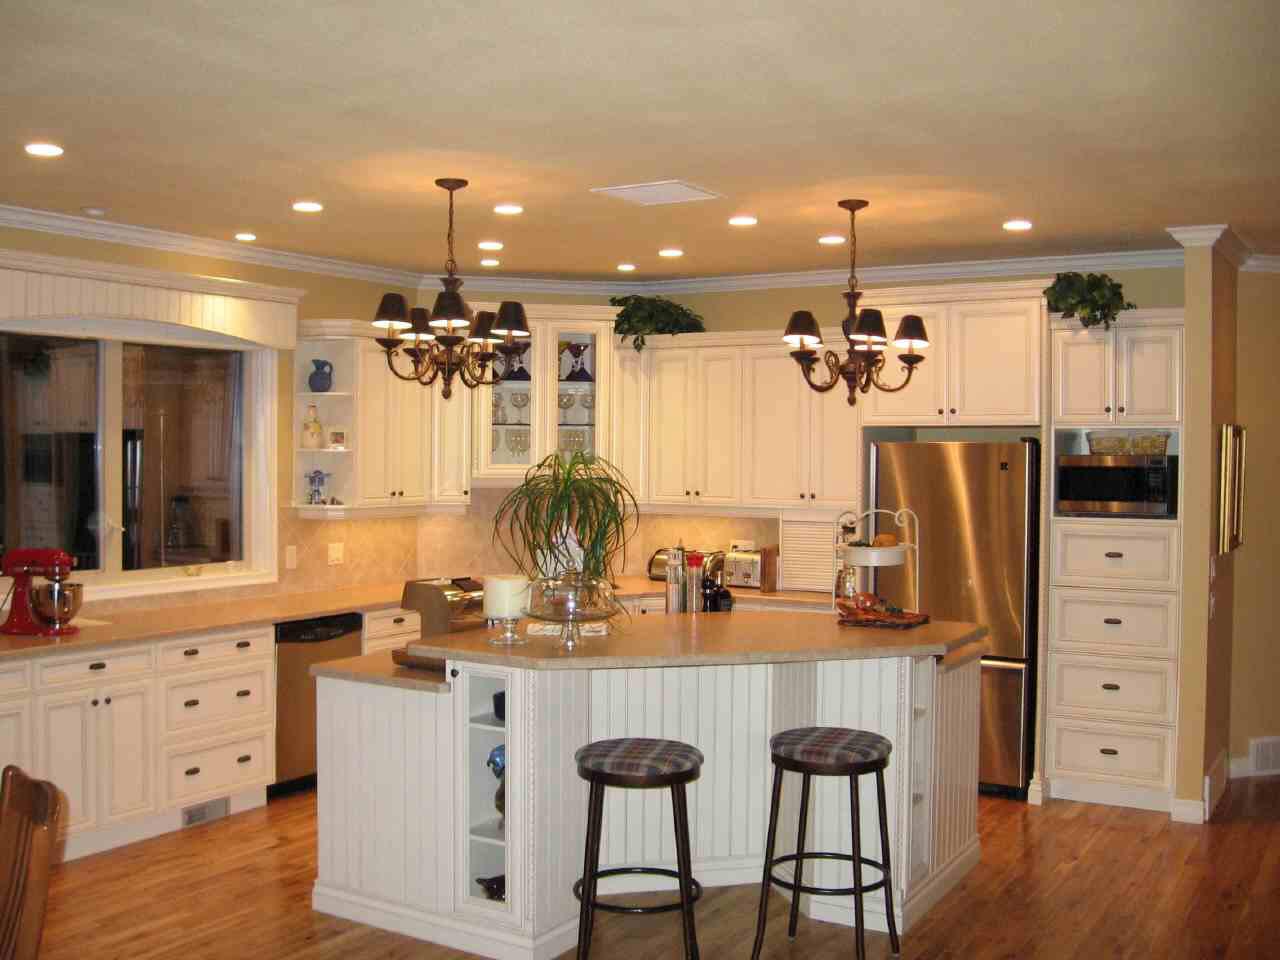 Extra kitchen storage photo - 1